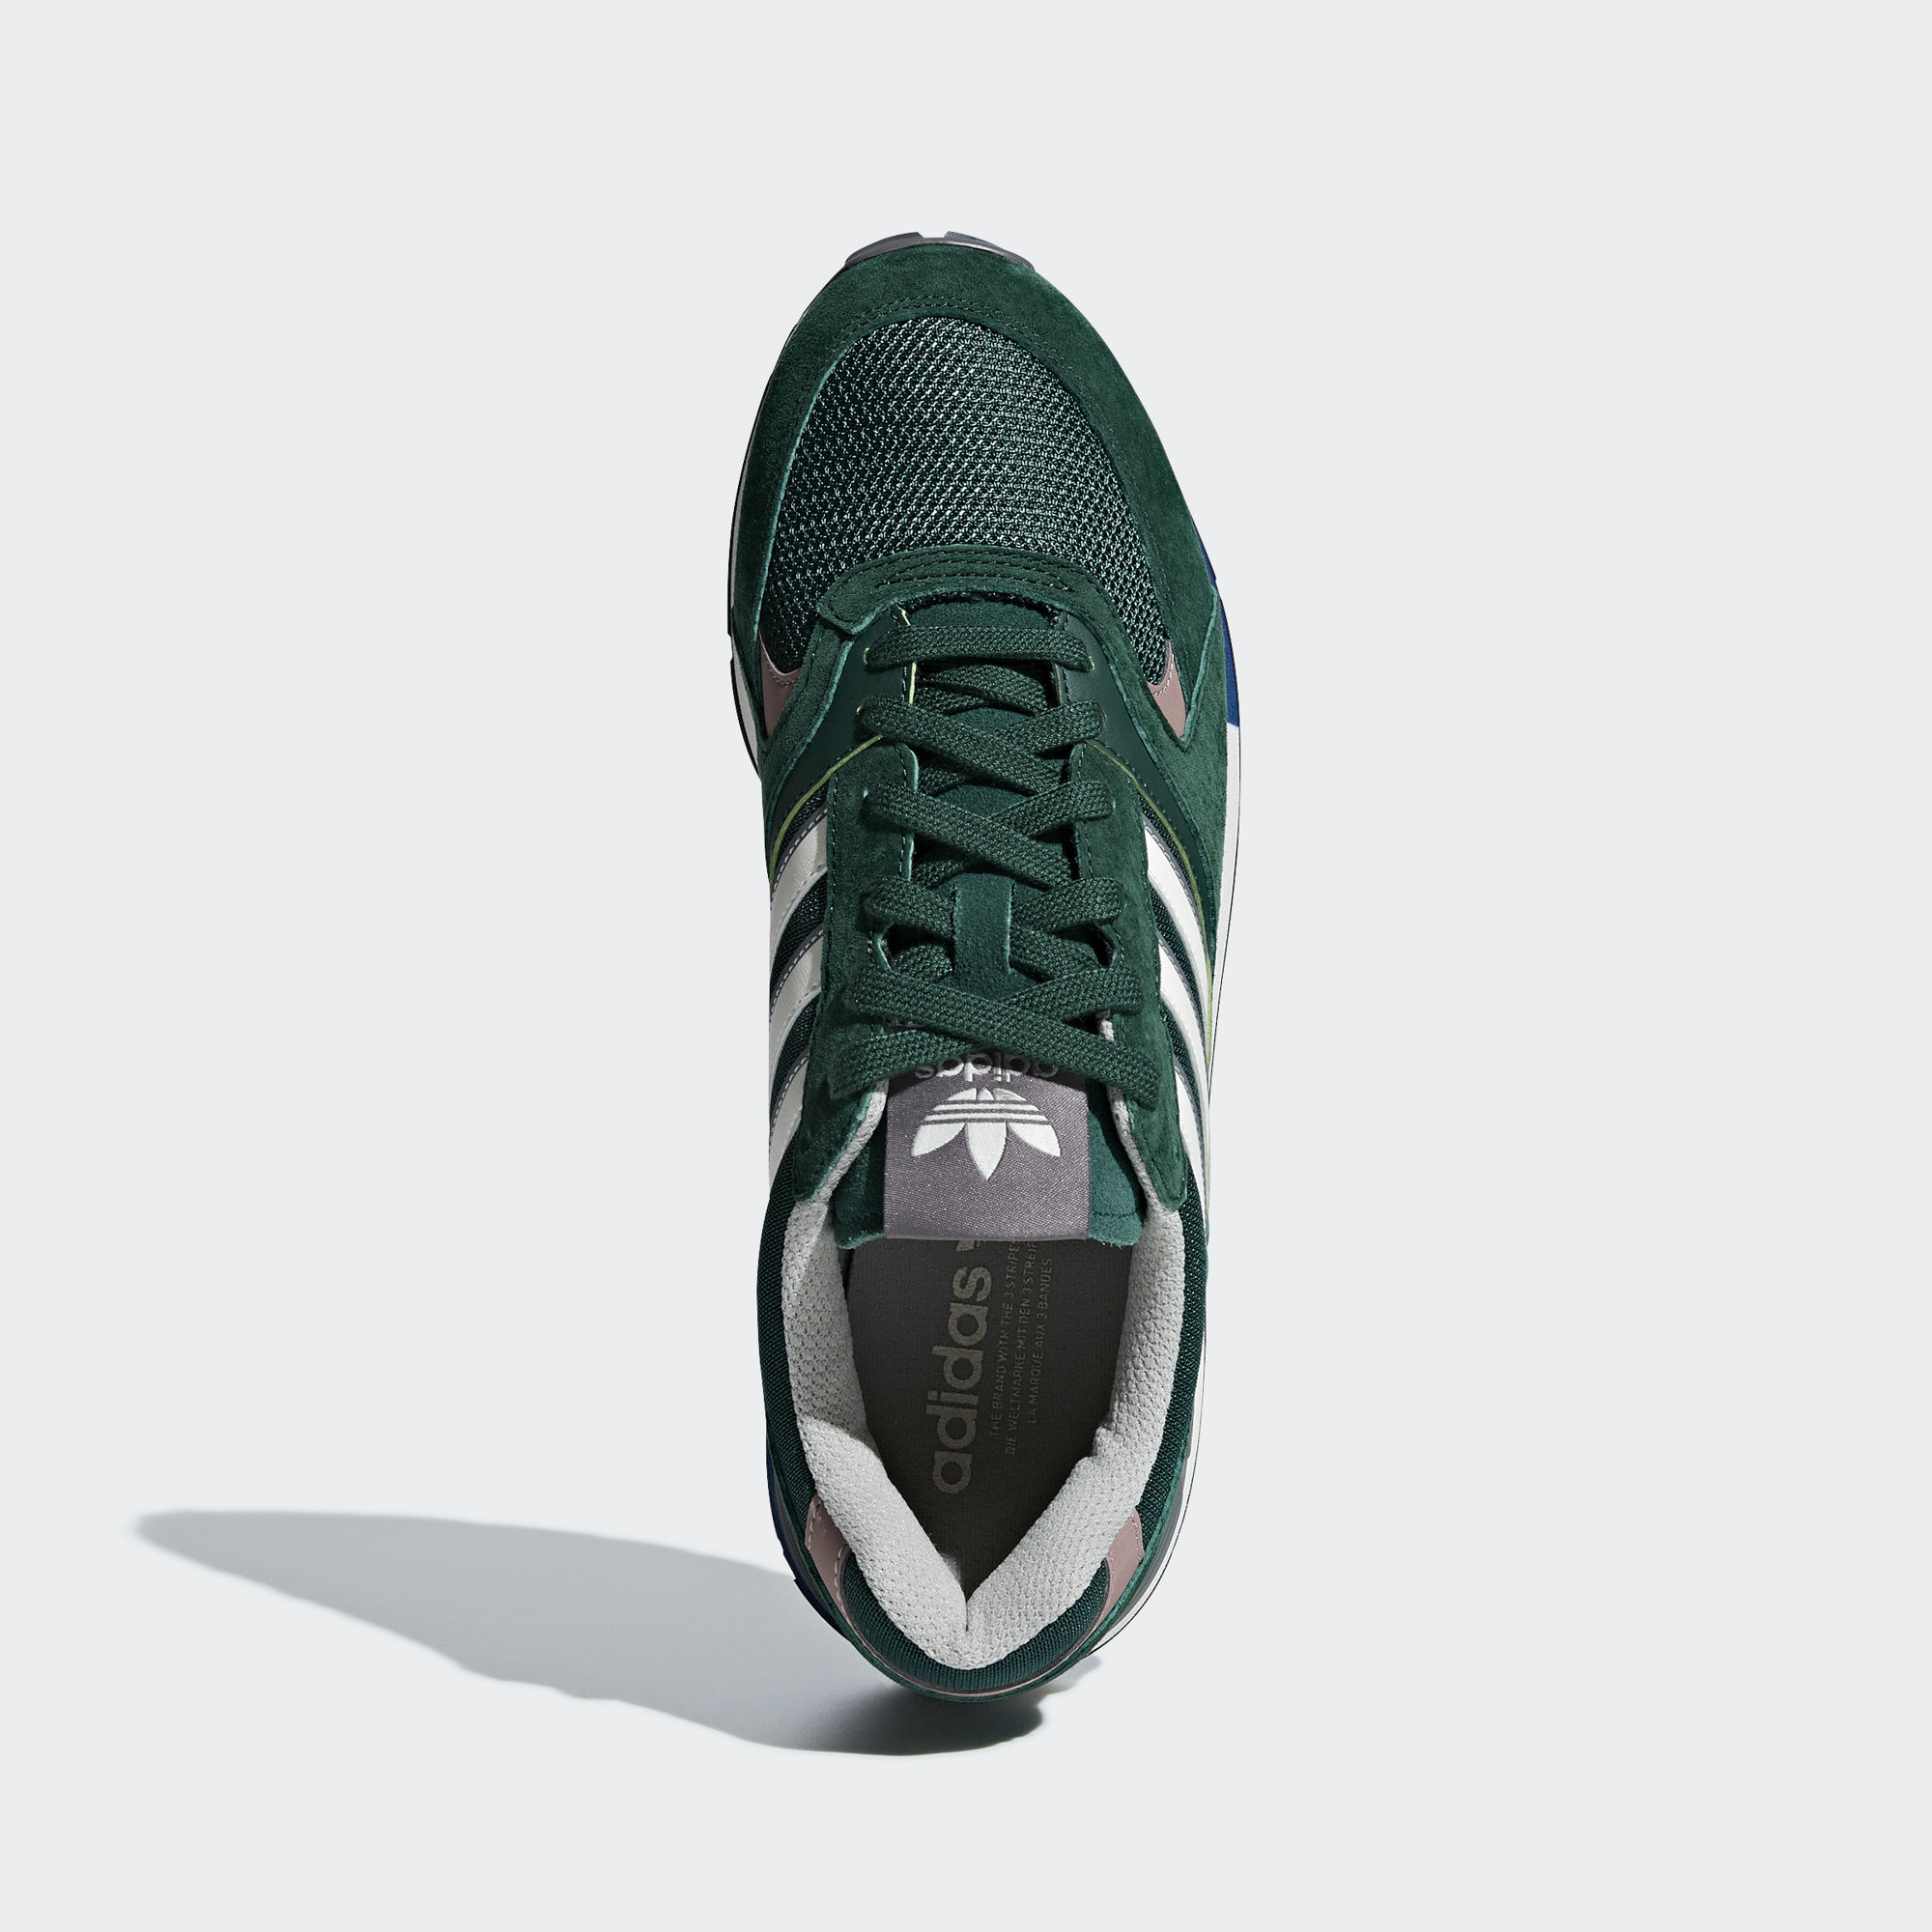 Adidas Quesence Collegiate Green / Noble Green / Chalk White (B37851)